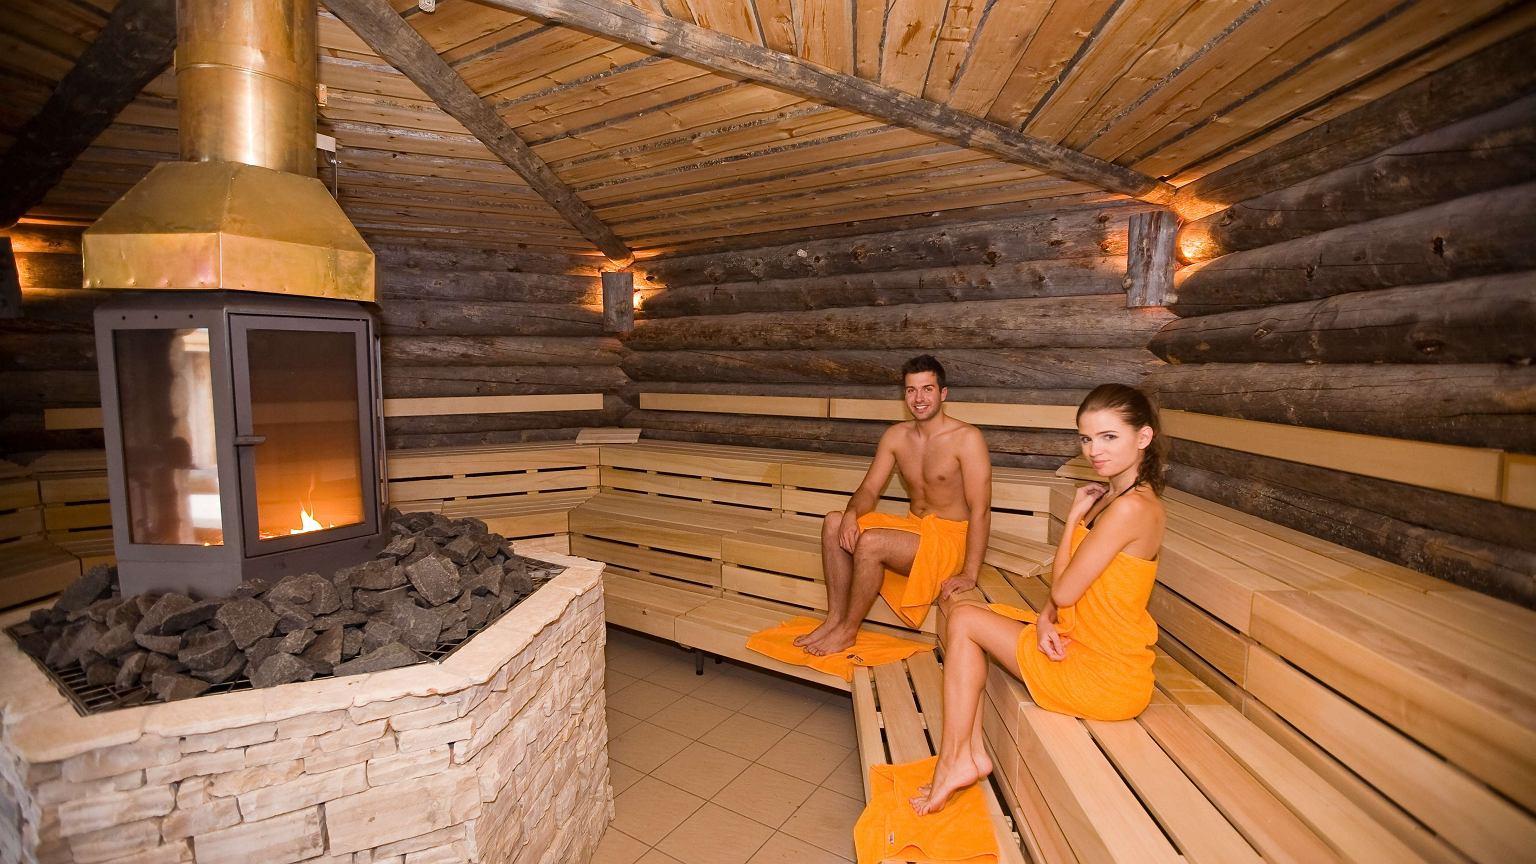 Sauna Versteckte Kamera